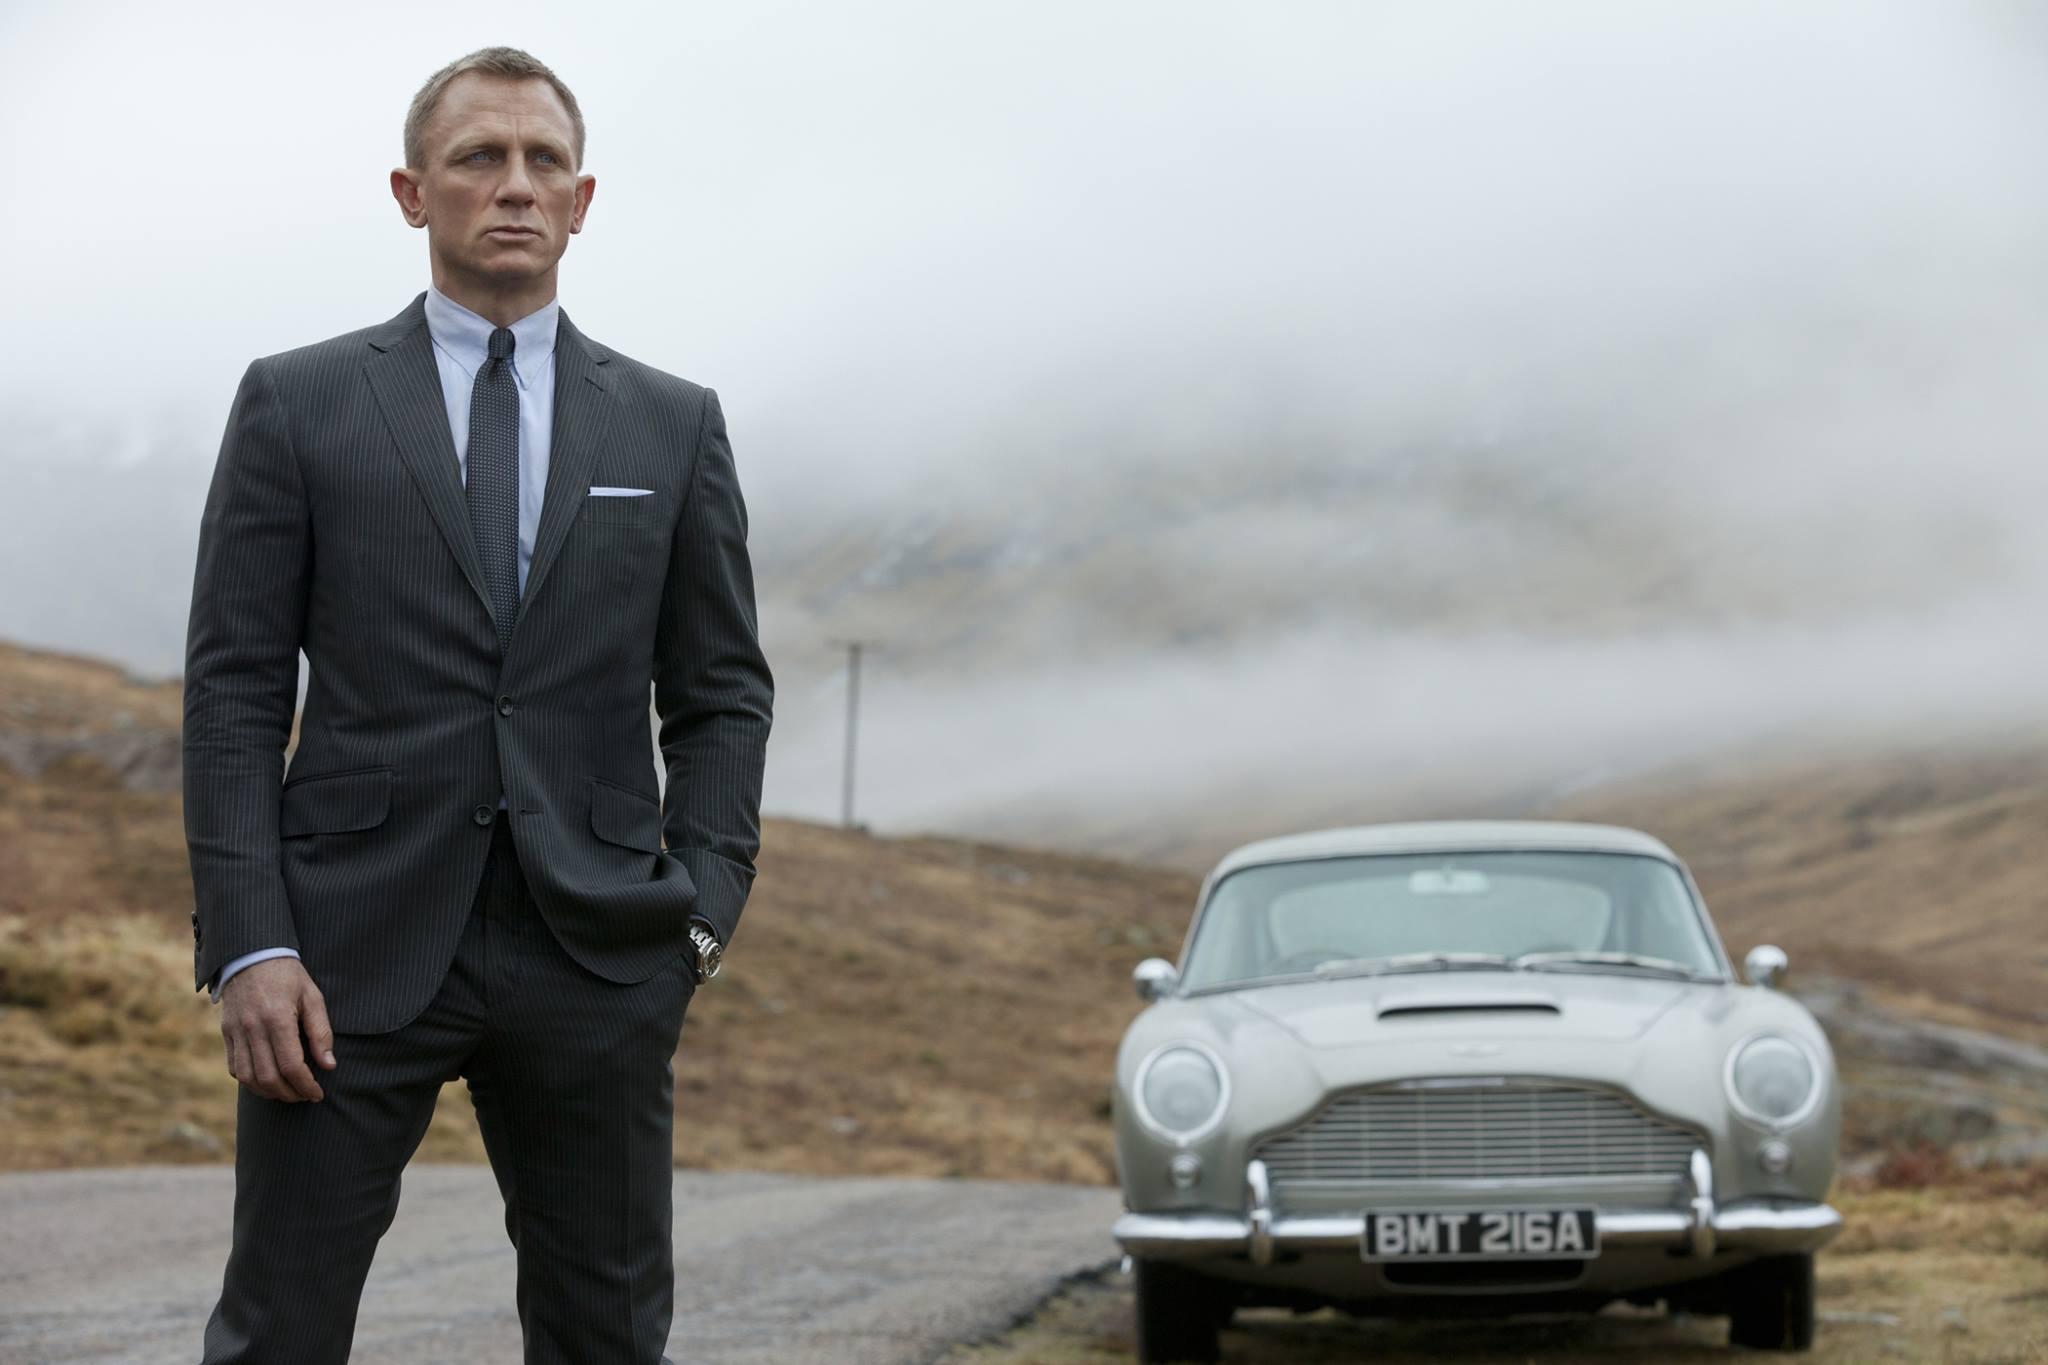 james Bond - Skyfall scottish highlands scene.